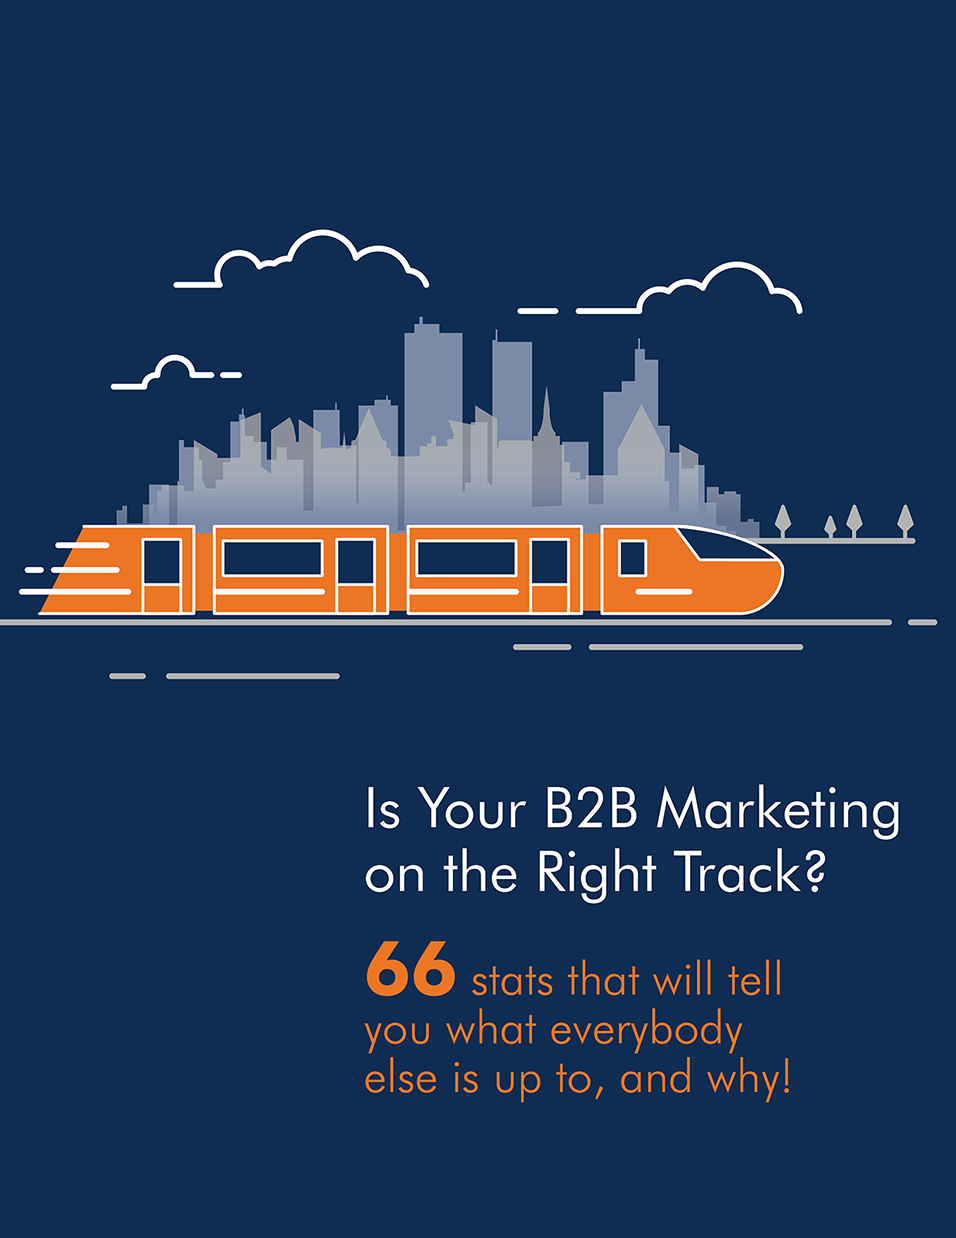 66 Stats for B2B Marketing